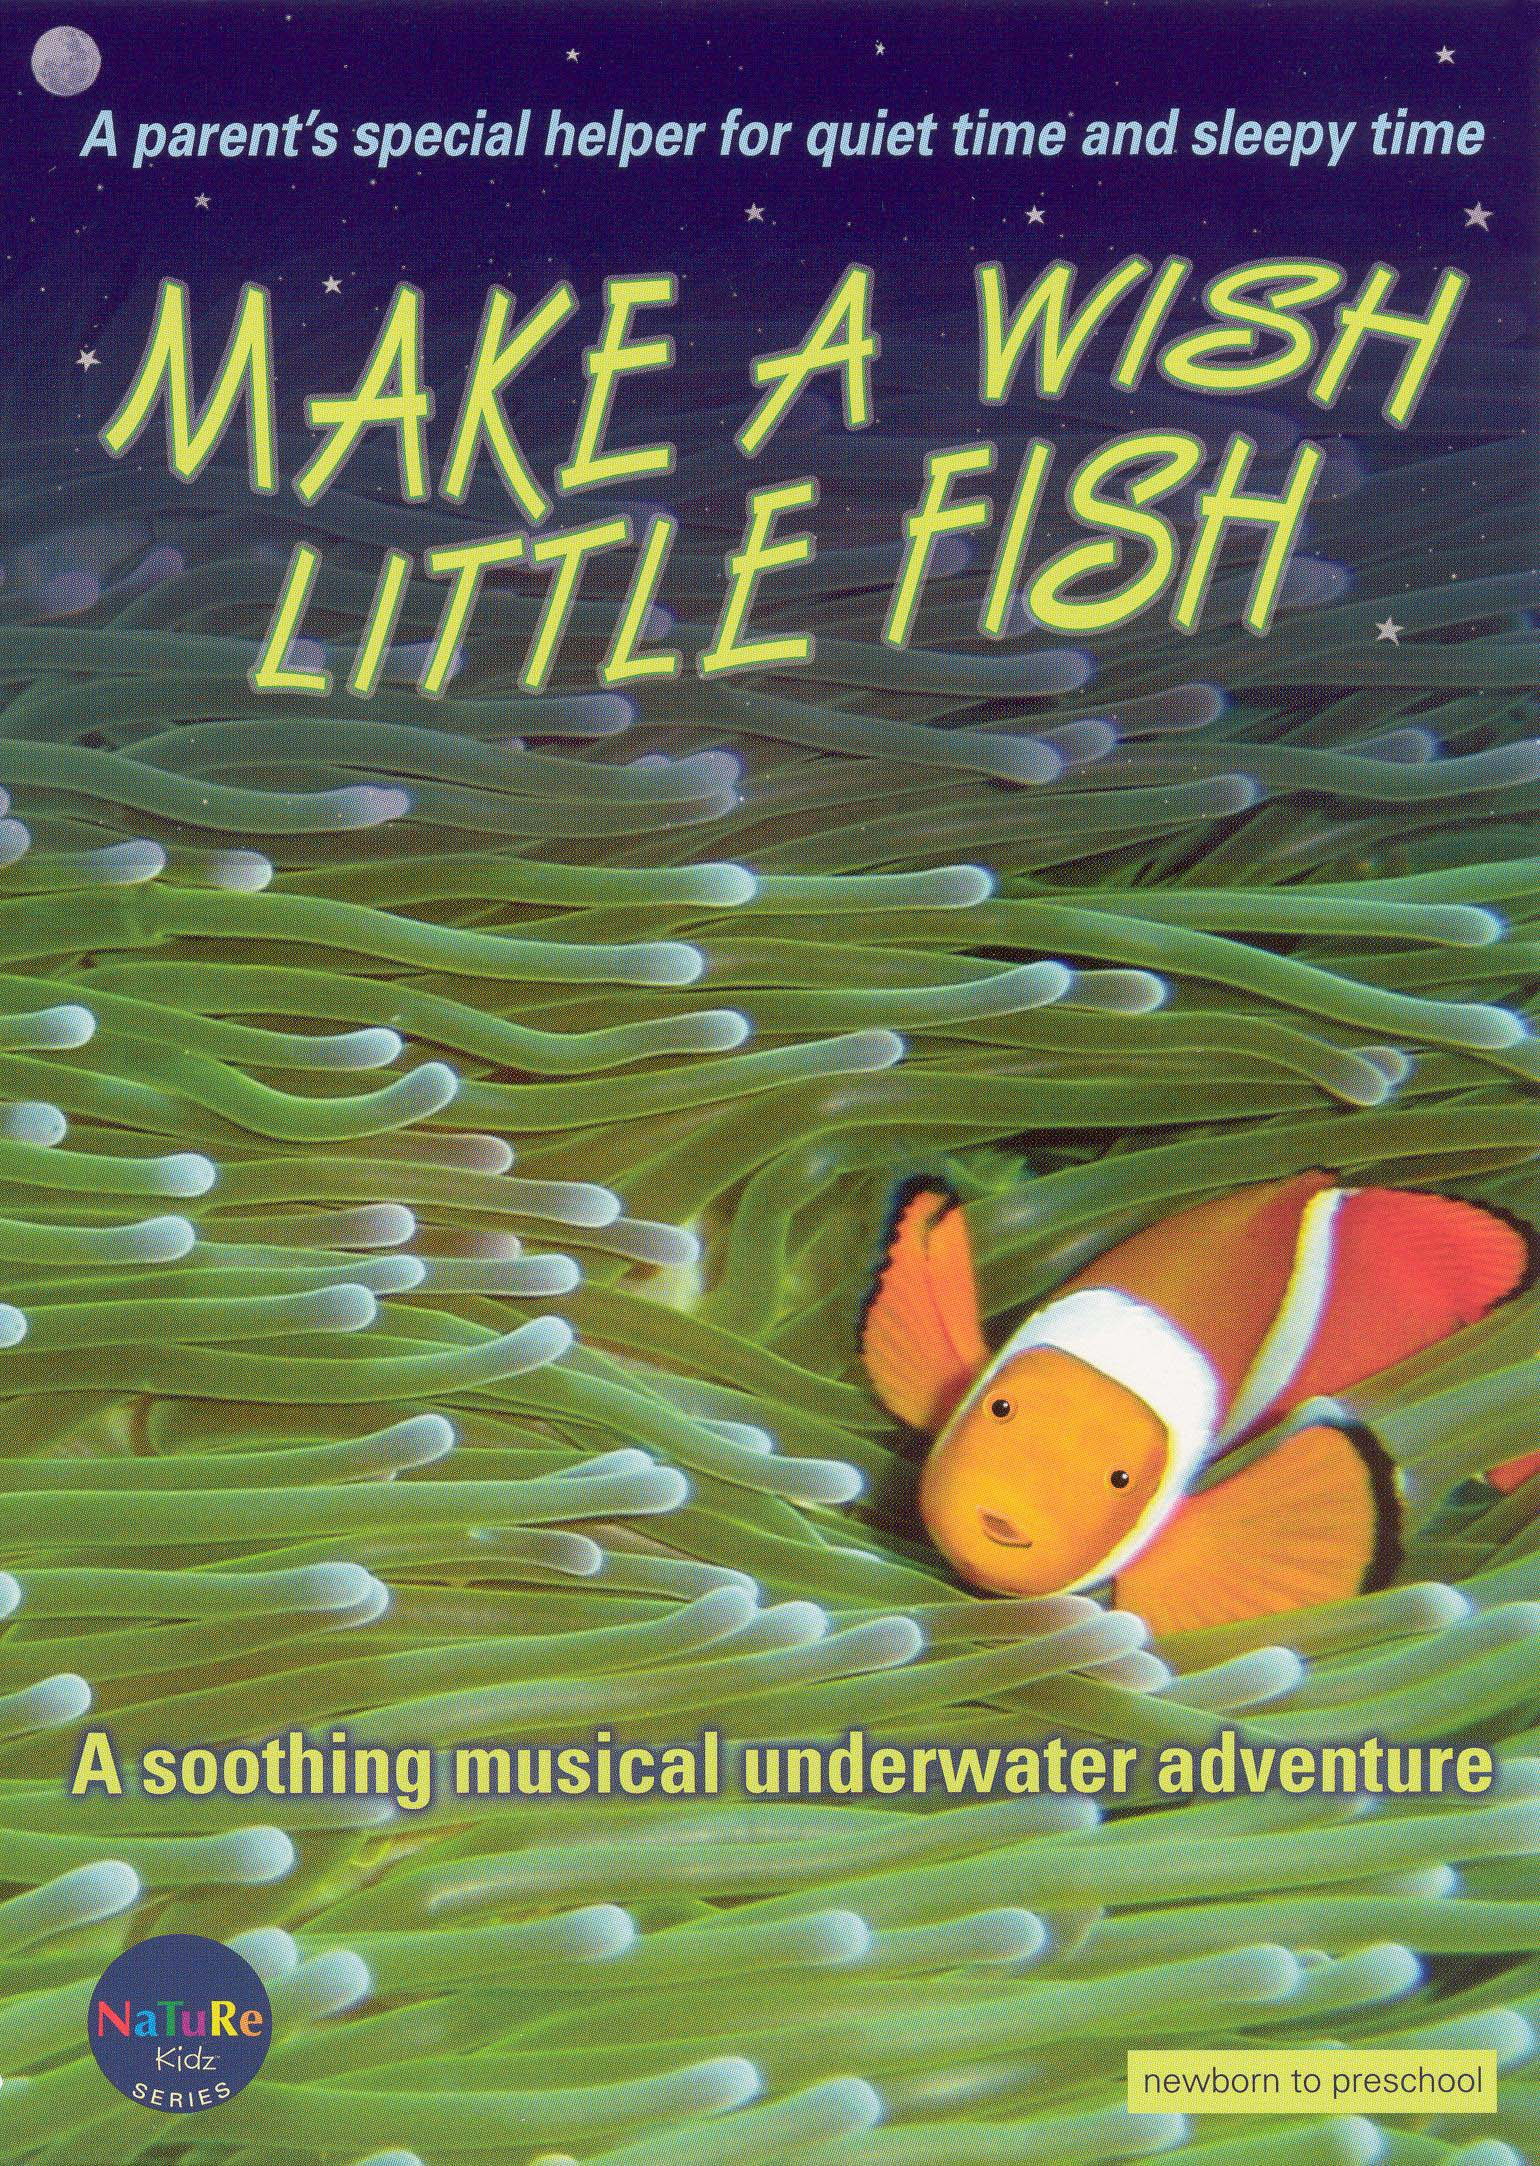 Make a Wish Little Fish